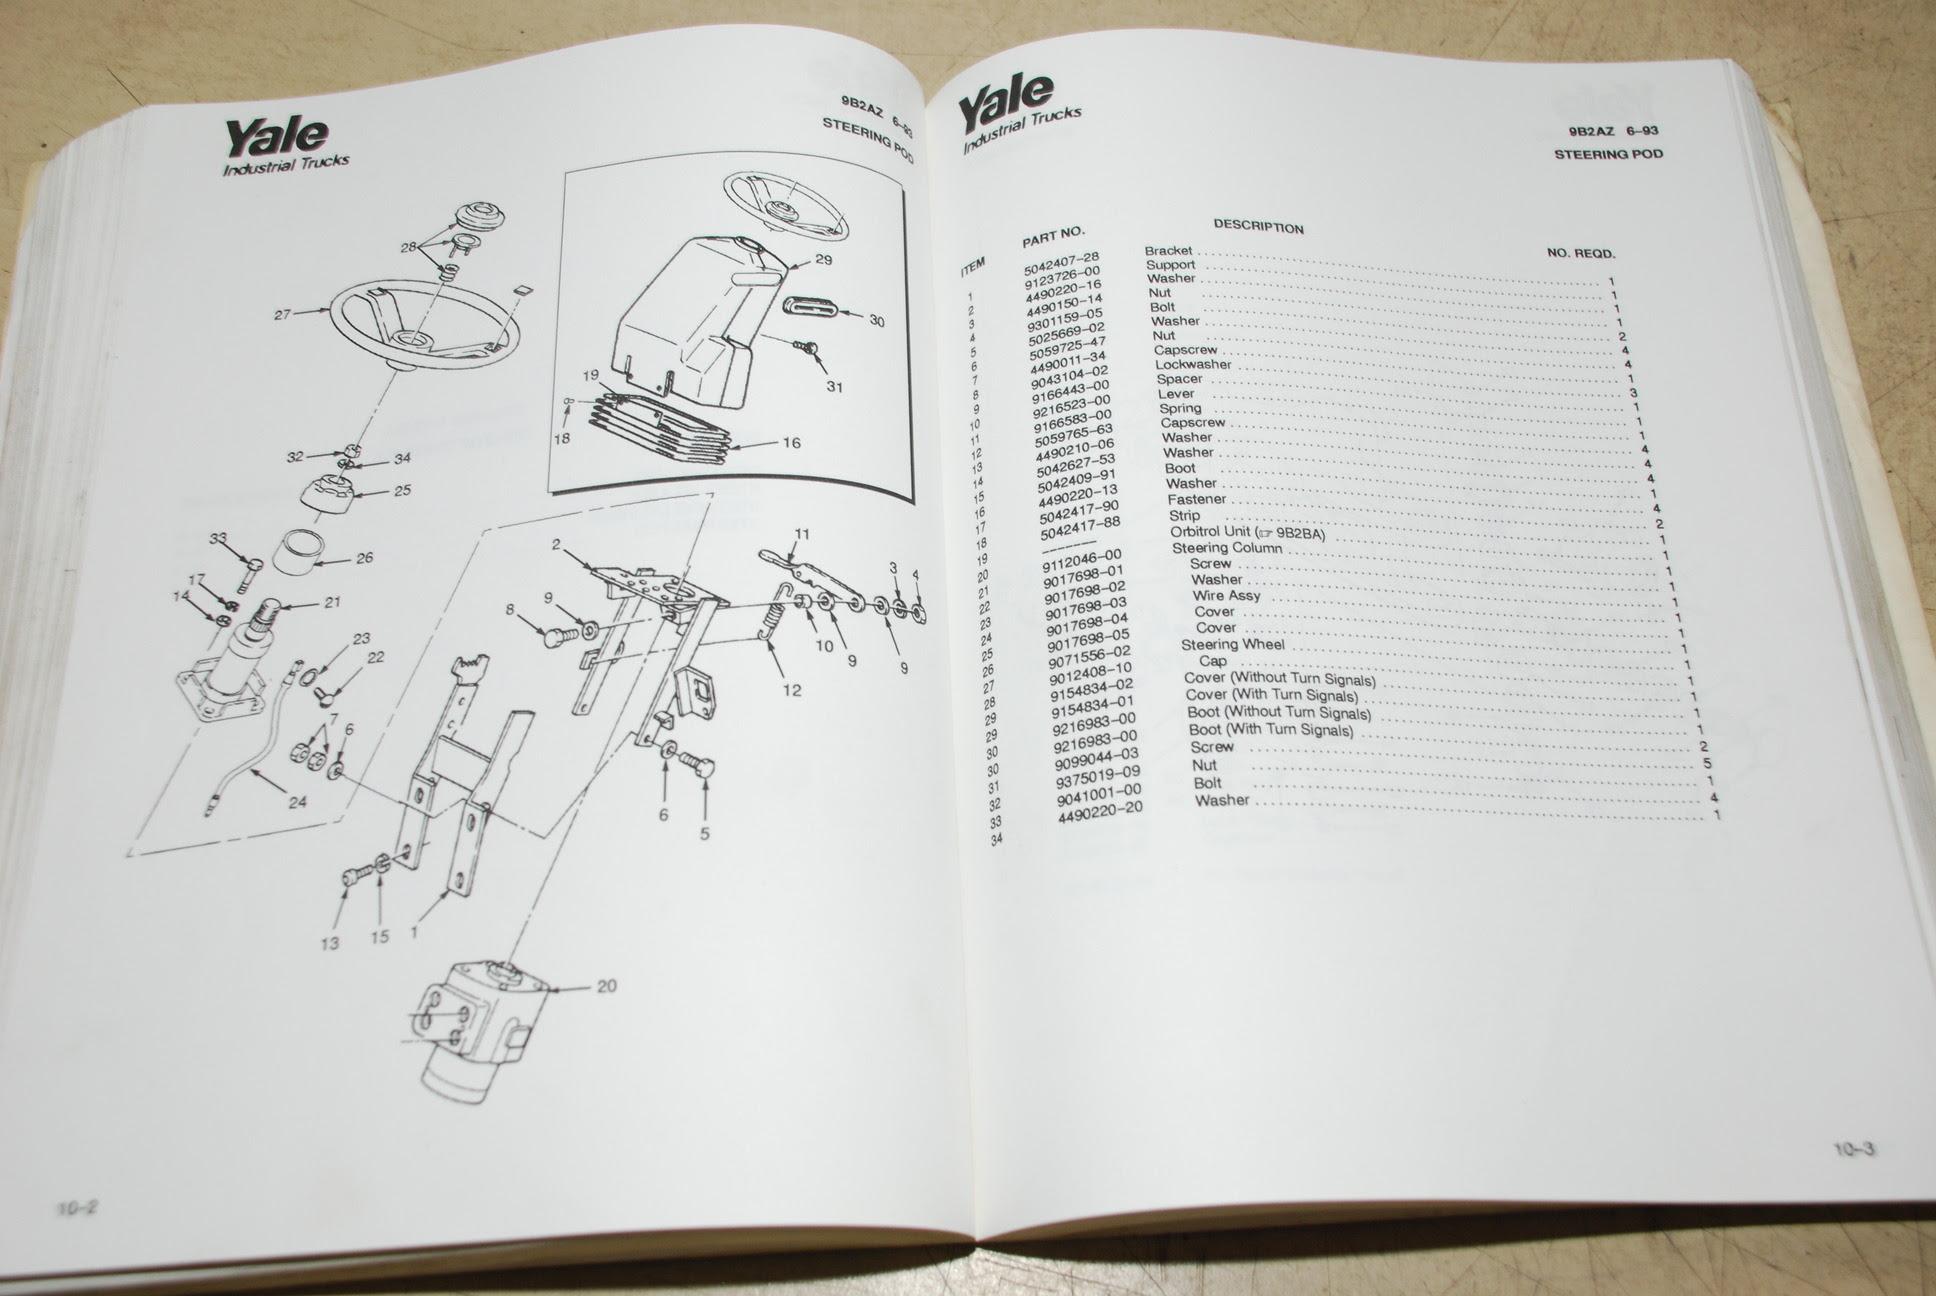 32 Yale Forklift Parts Diagram